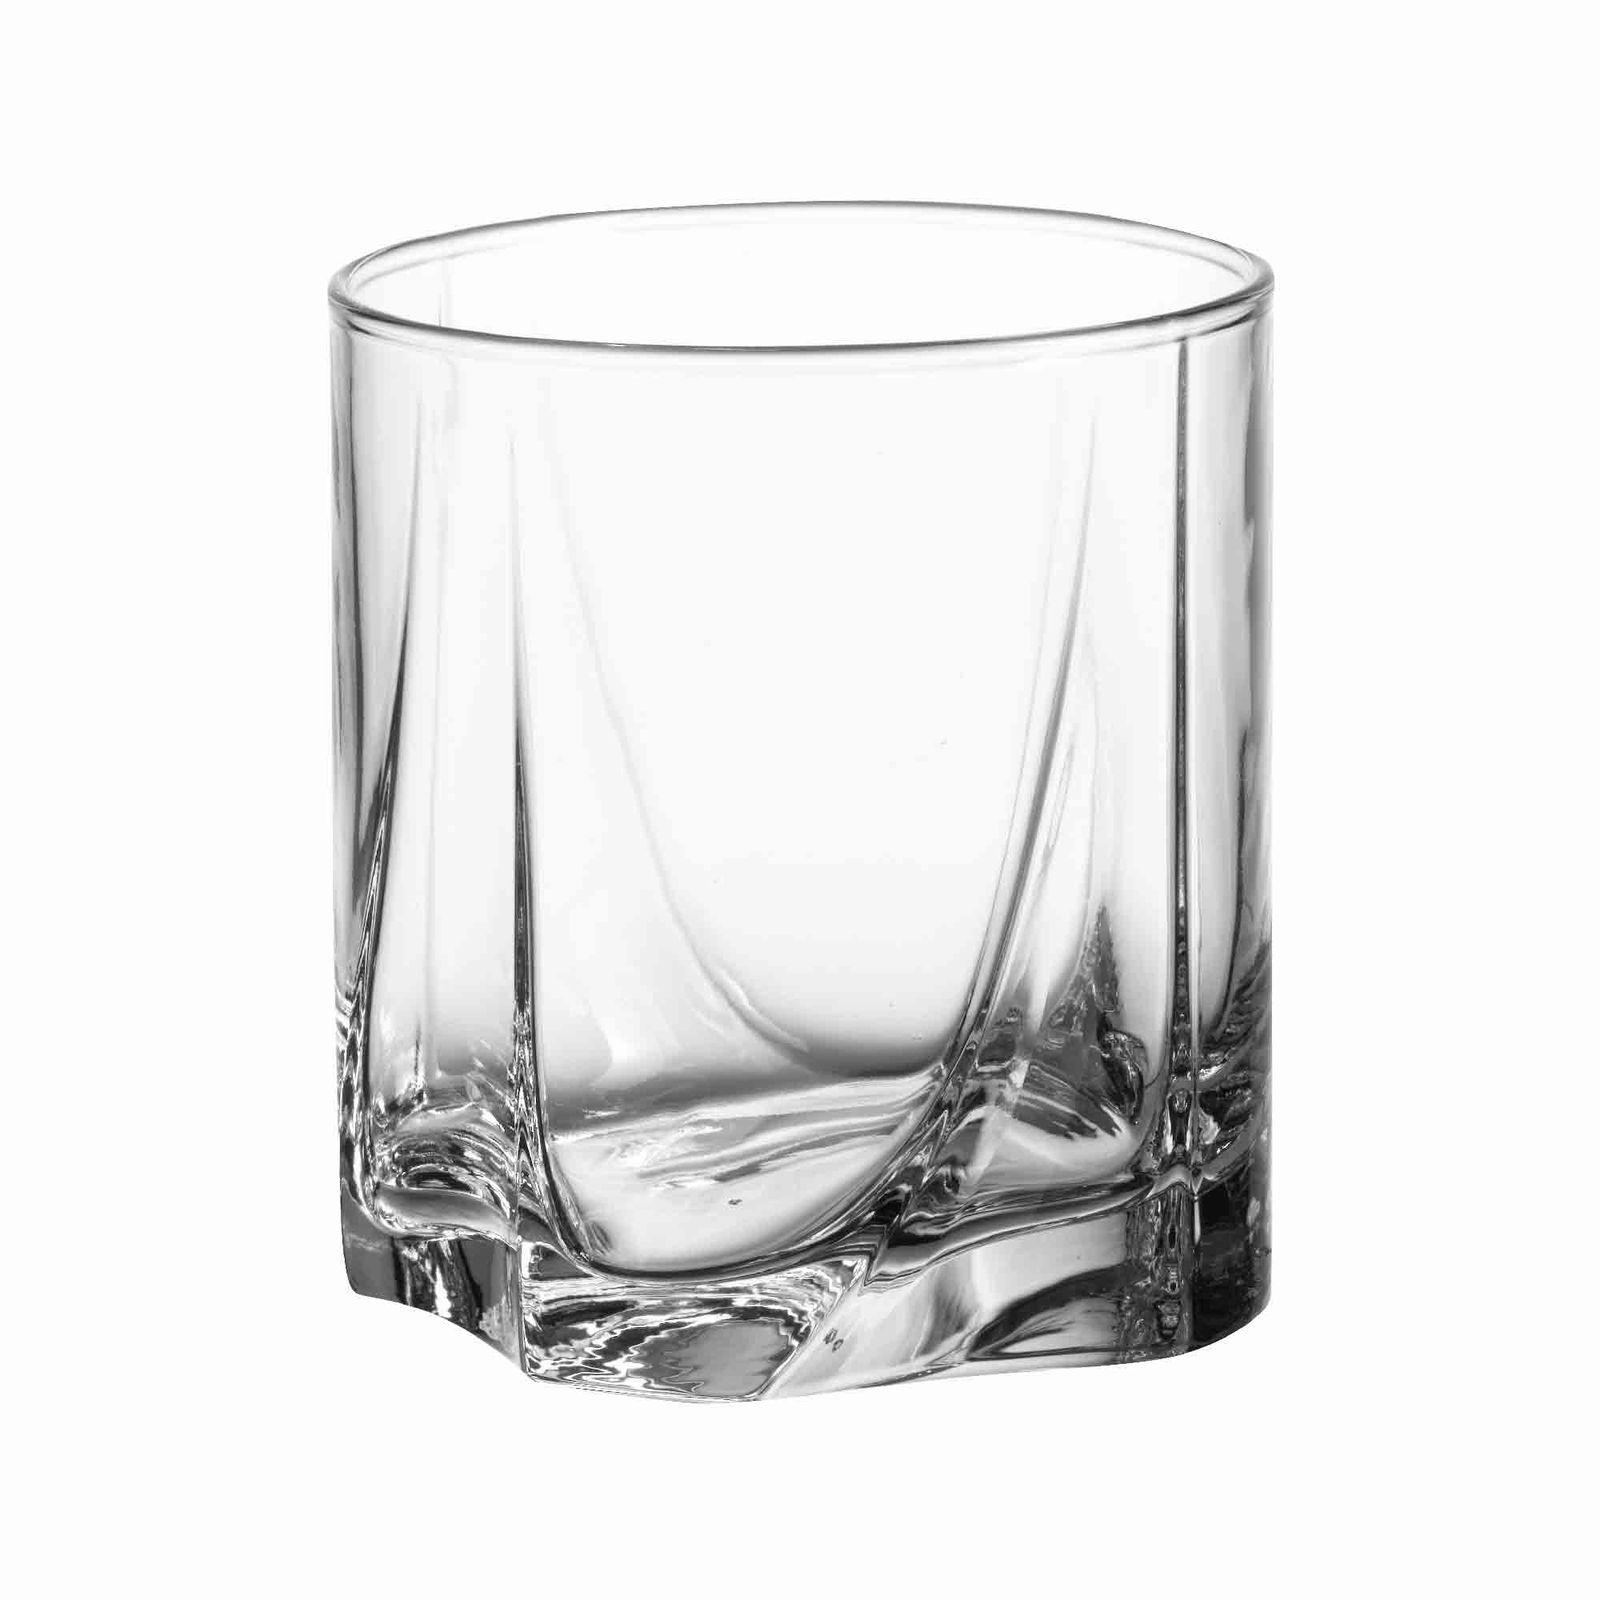 Set of 3 low glasses Luna 368 ml PASABAHCE